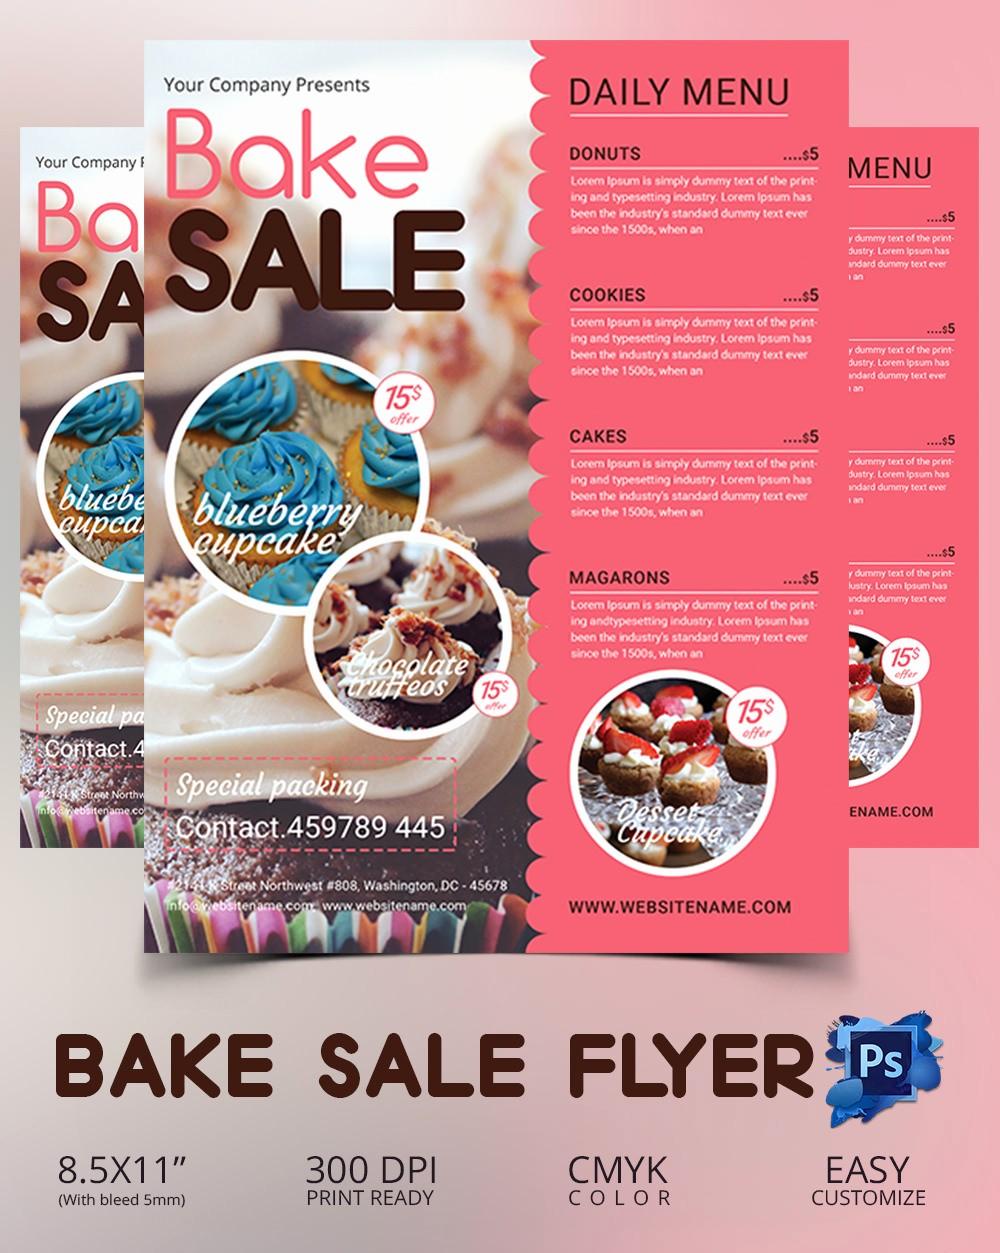 Bake Sale Flyer Template Free Fresh Design Templates Flyer Bake Sale Template Business